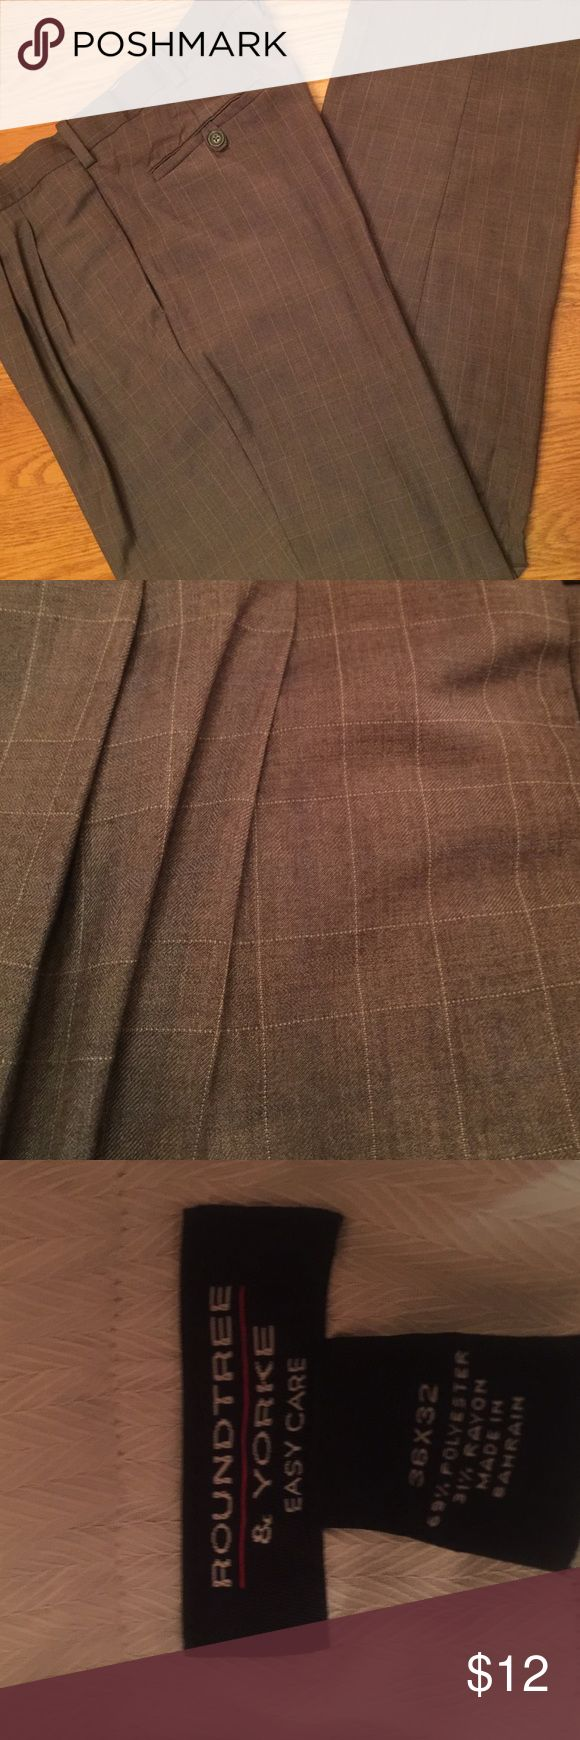 Men's Dress Pants sz 36x32 Roundtree & Yorke Men's Dress Pants sz 36x32 grayish Roundtree & Yorke Pants Dress